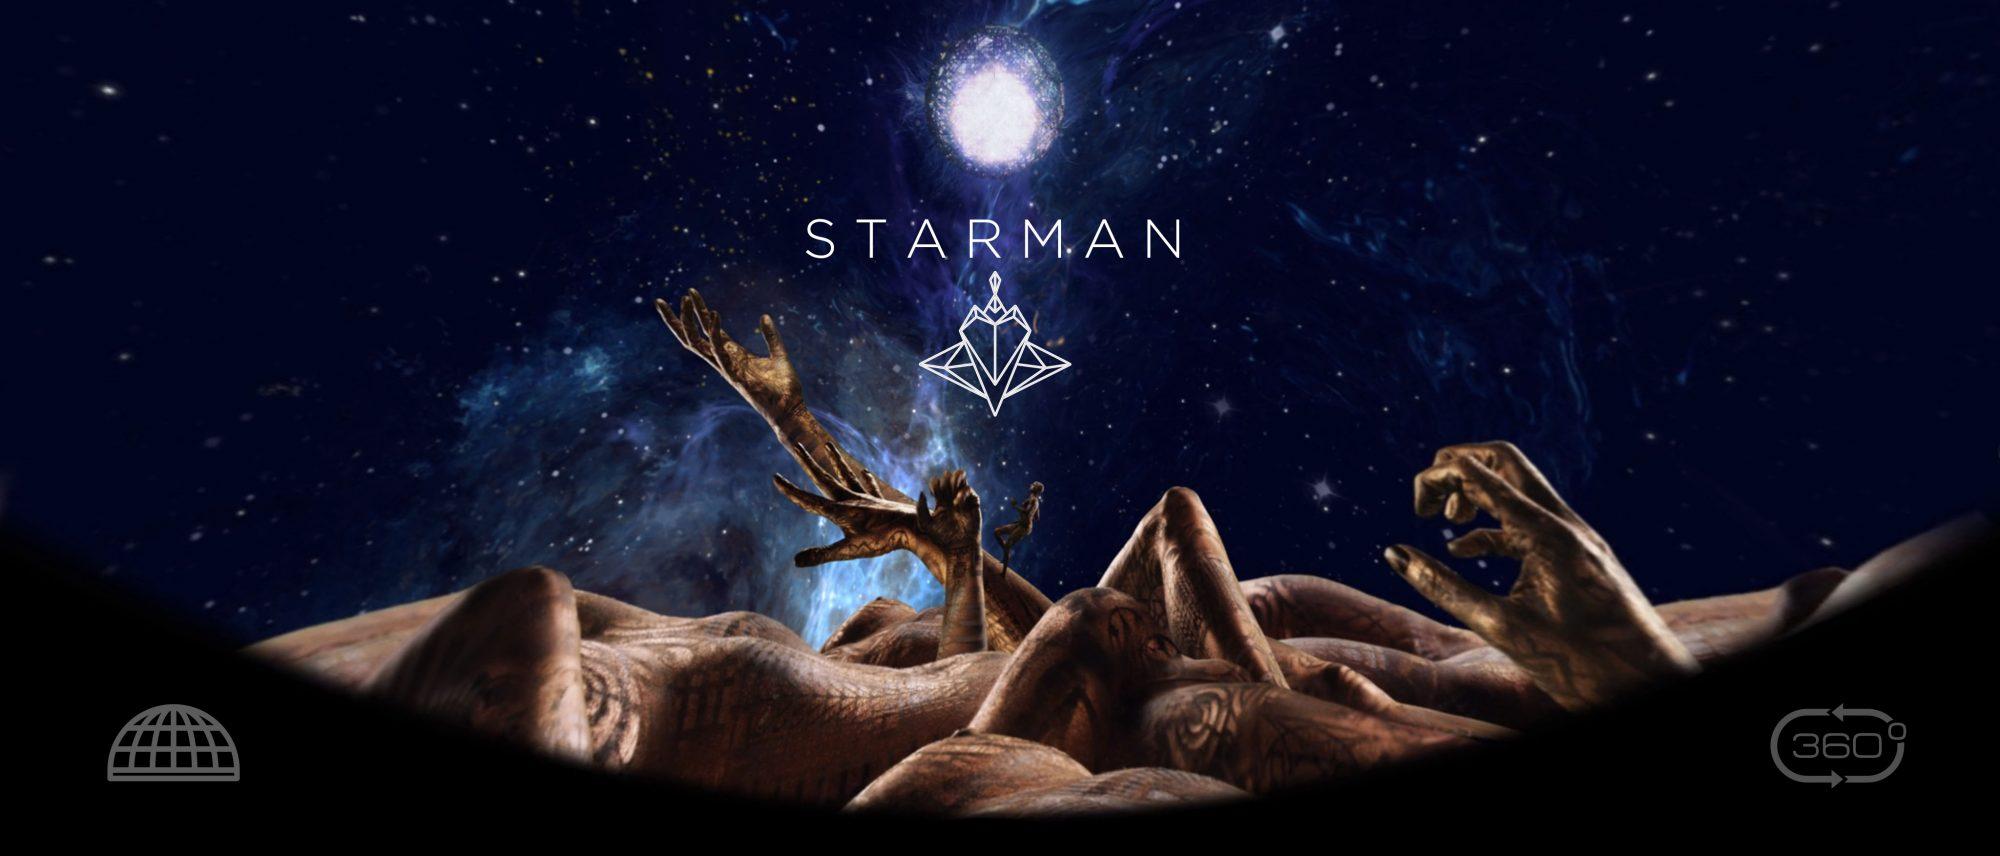 FP_dom_Starman_withoutLogos